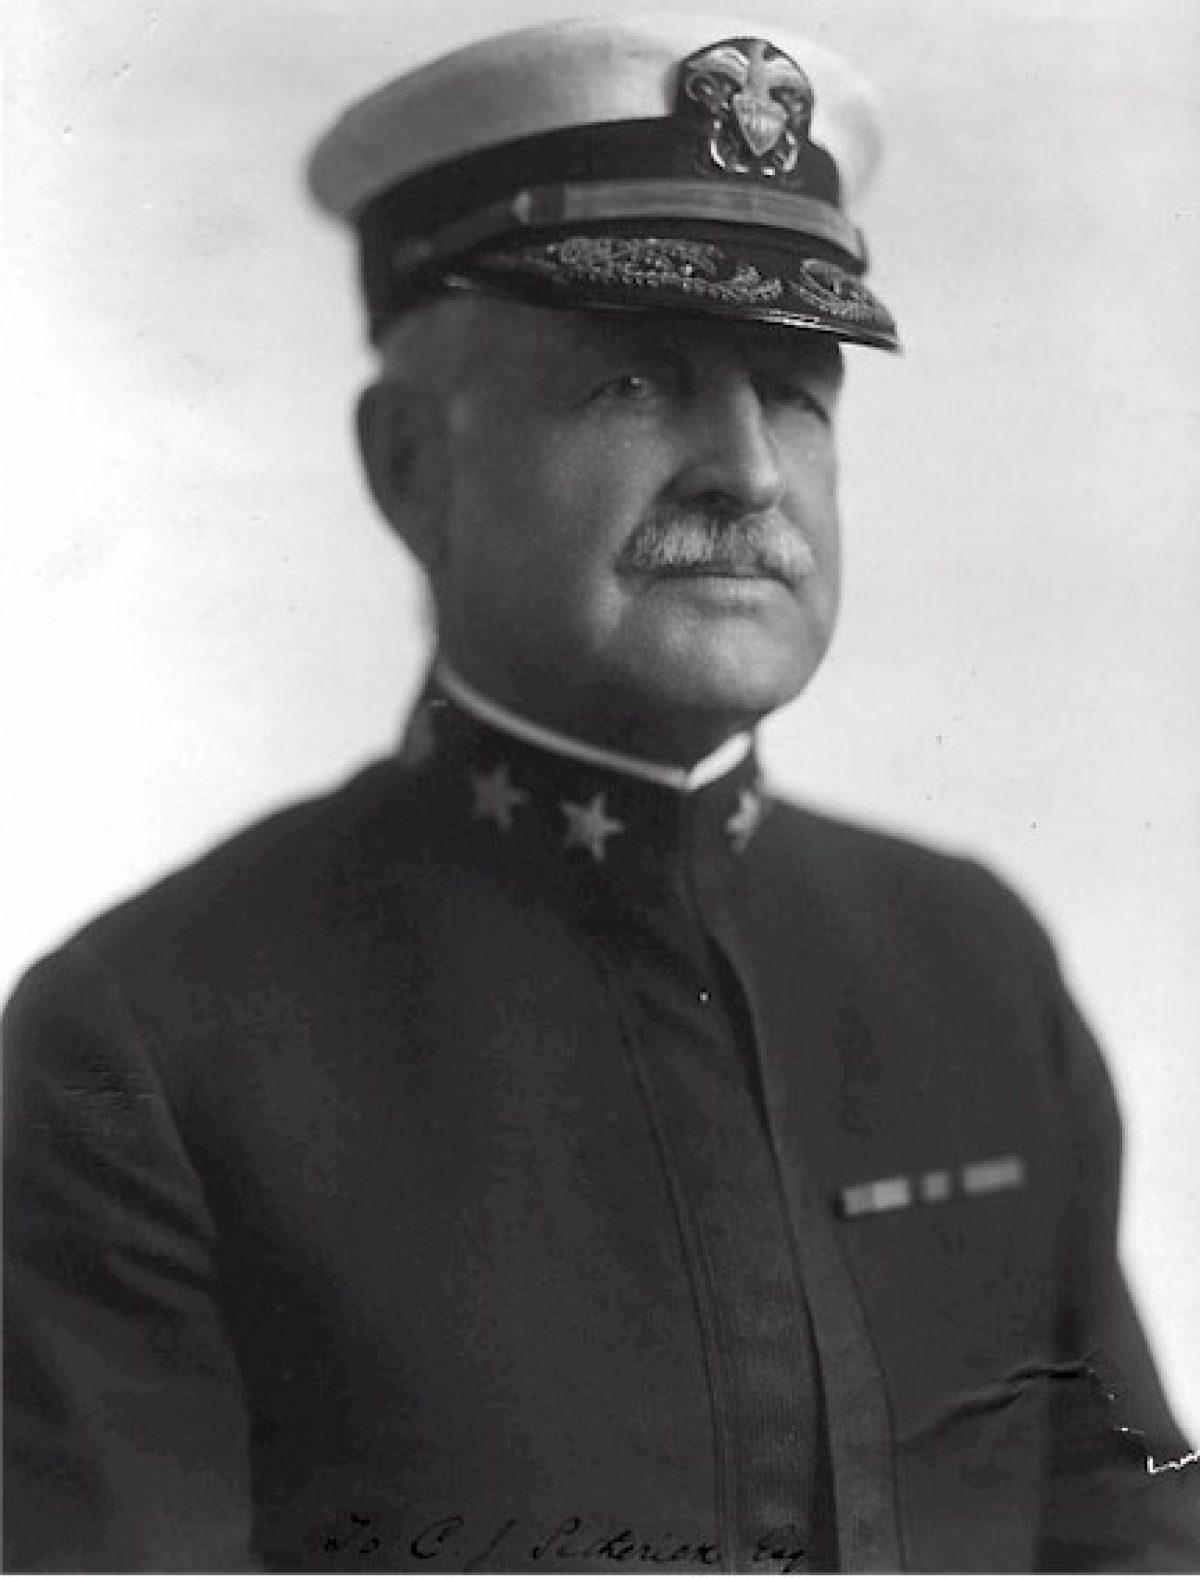 Caspar F. Goodrich